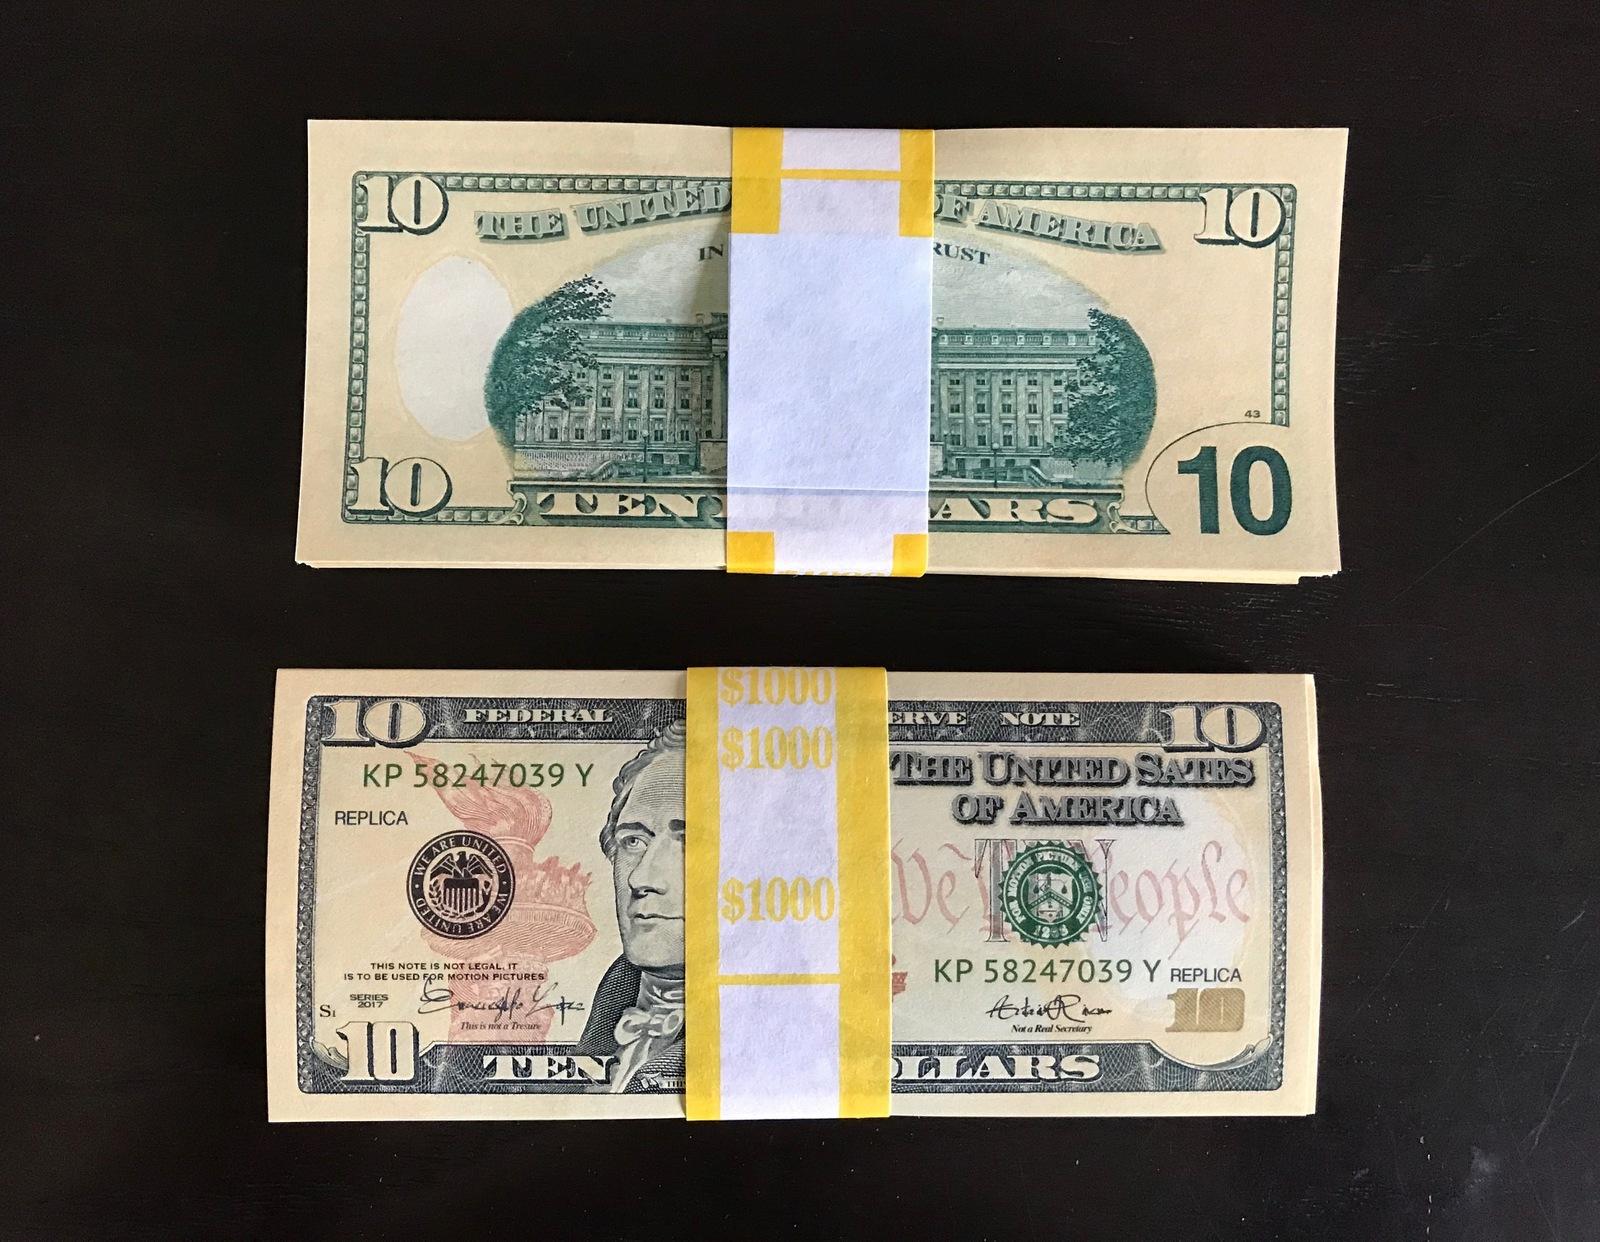 1.000 PROP MONEY REPLICA 10s All Full Print For Movie Video Films etc.